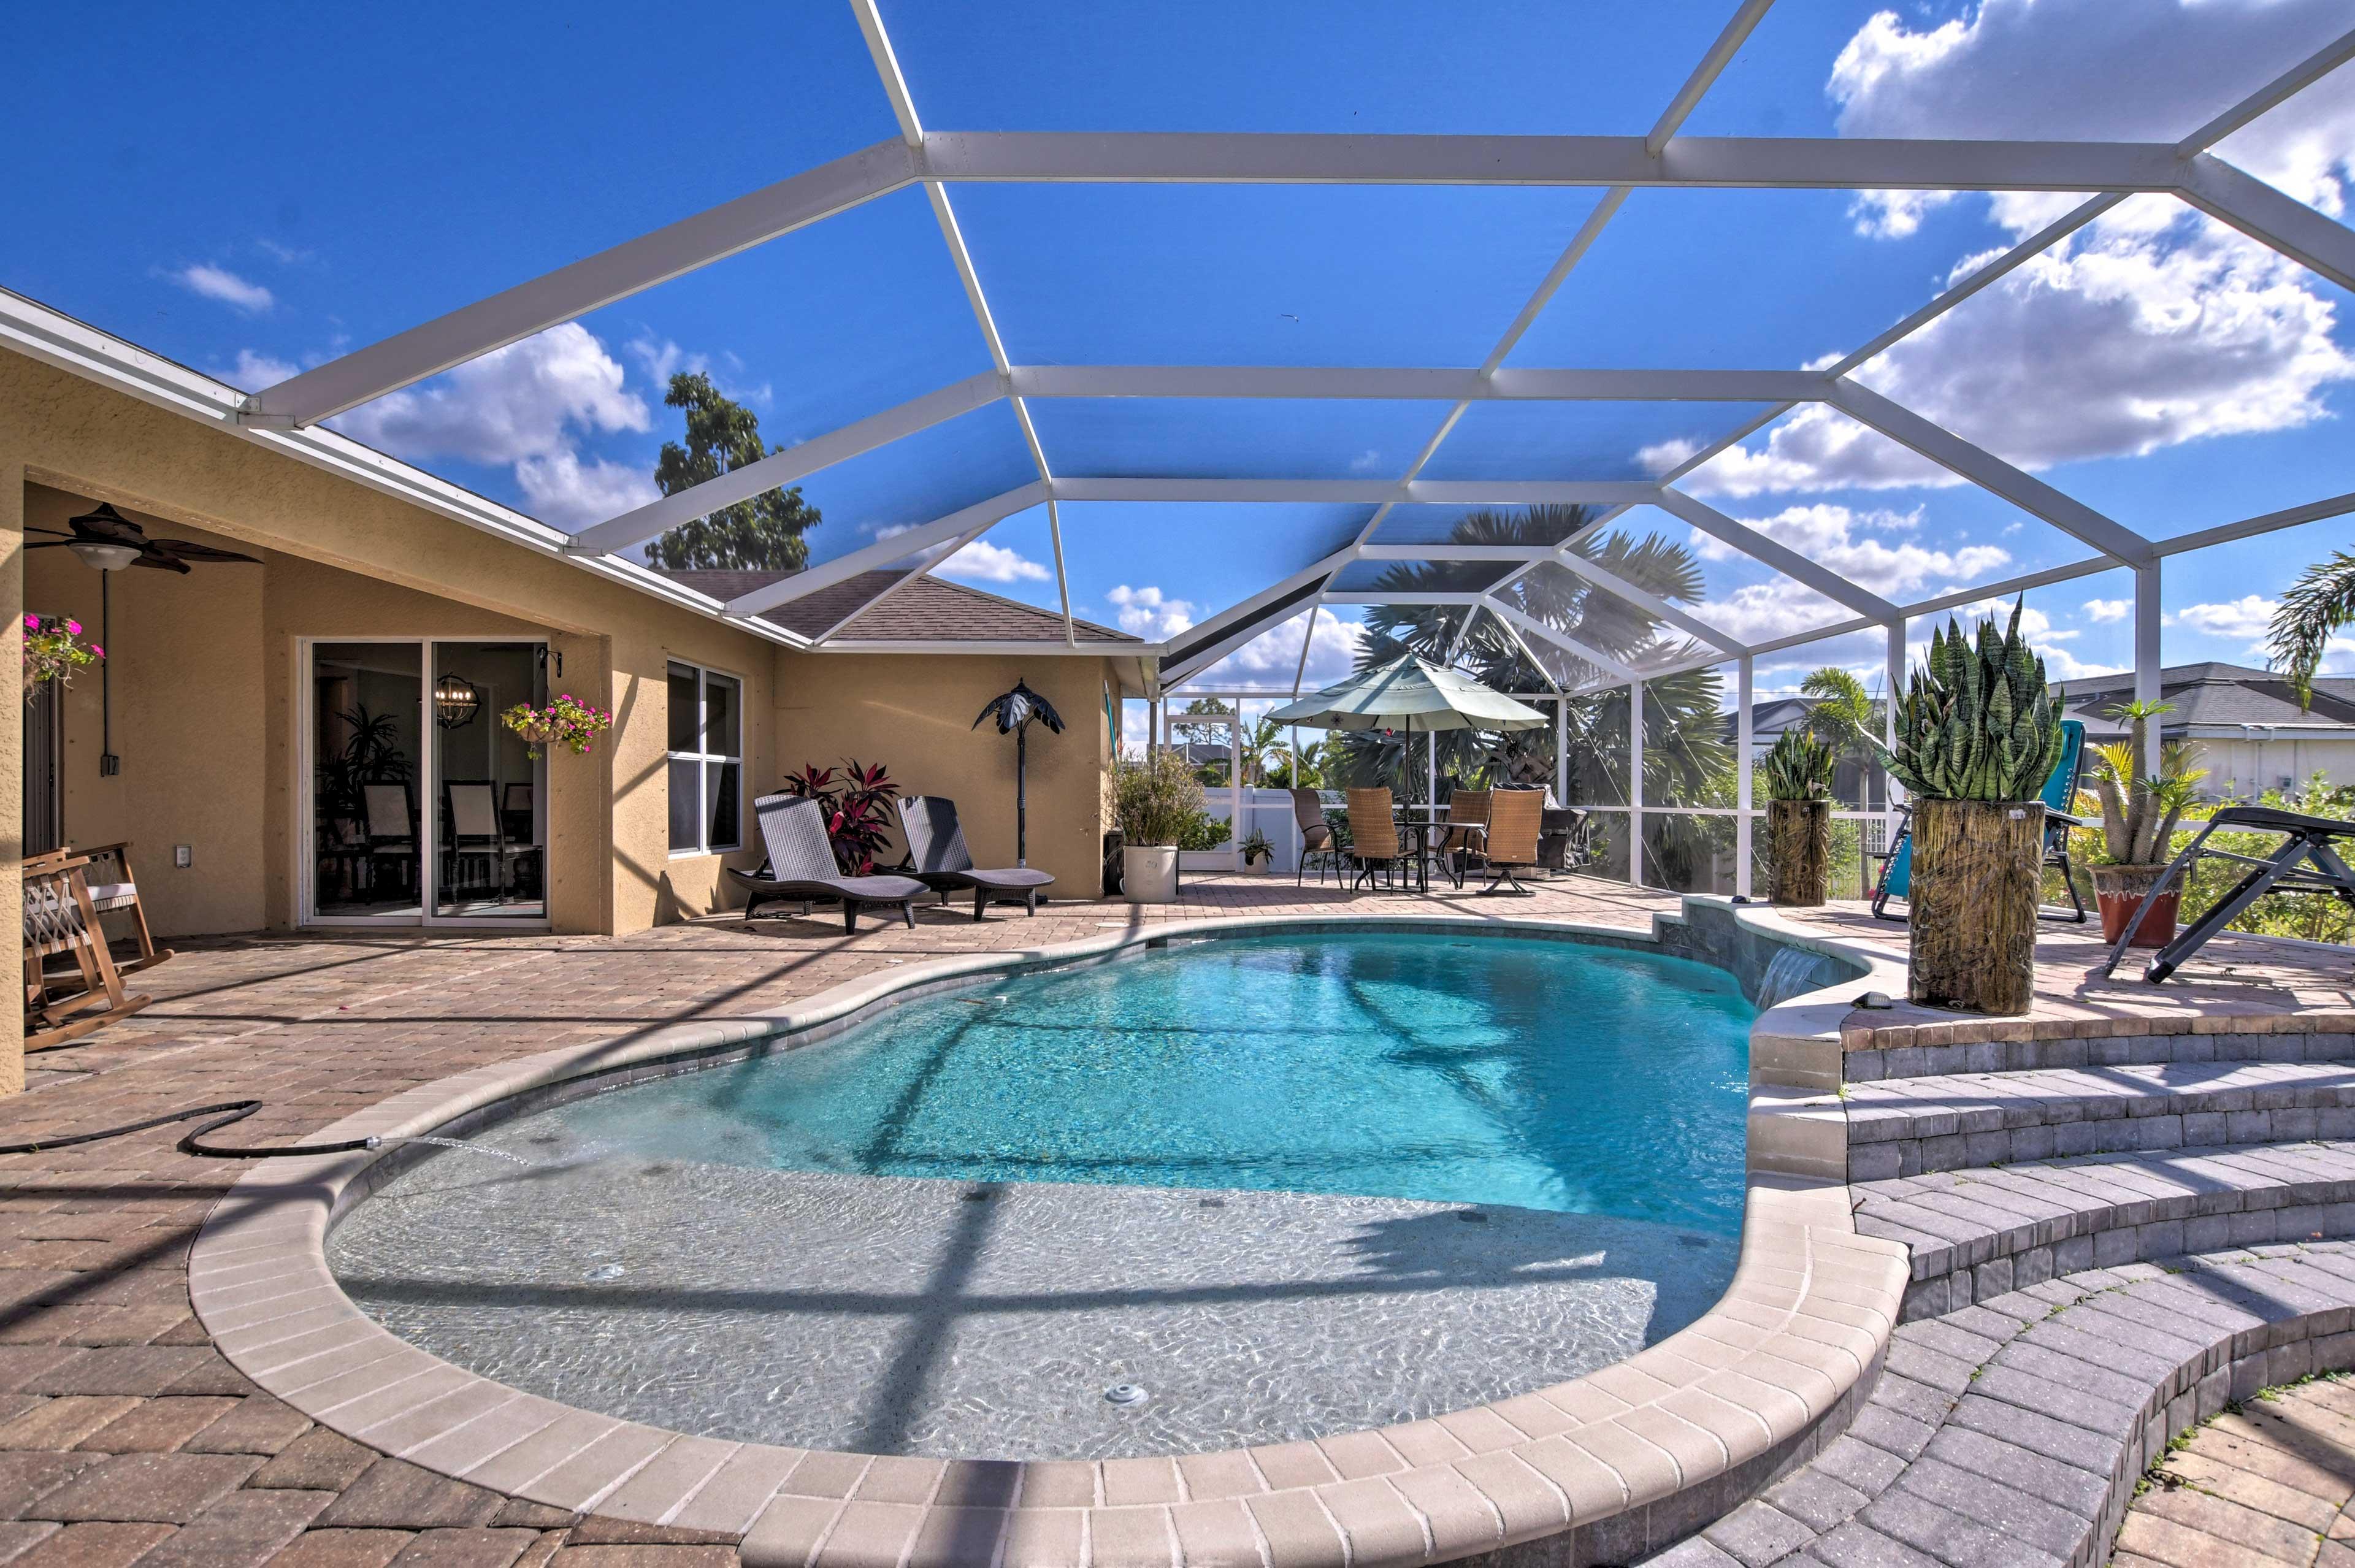 You'll love this tropical environment!